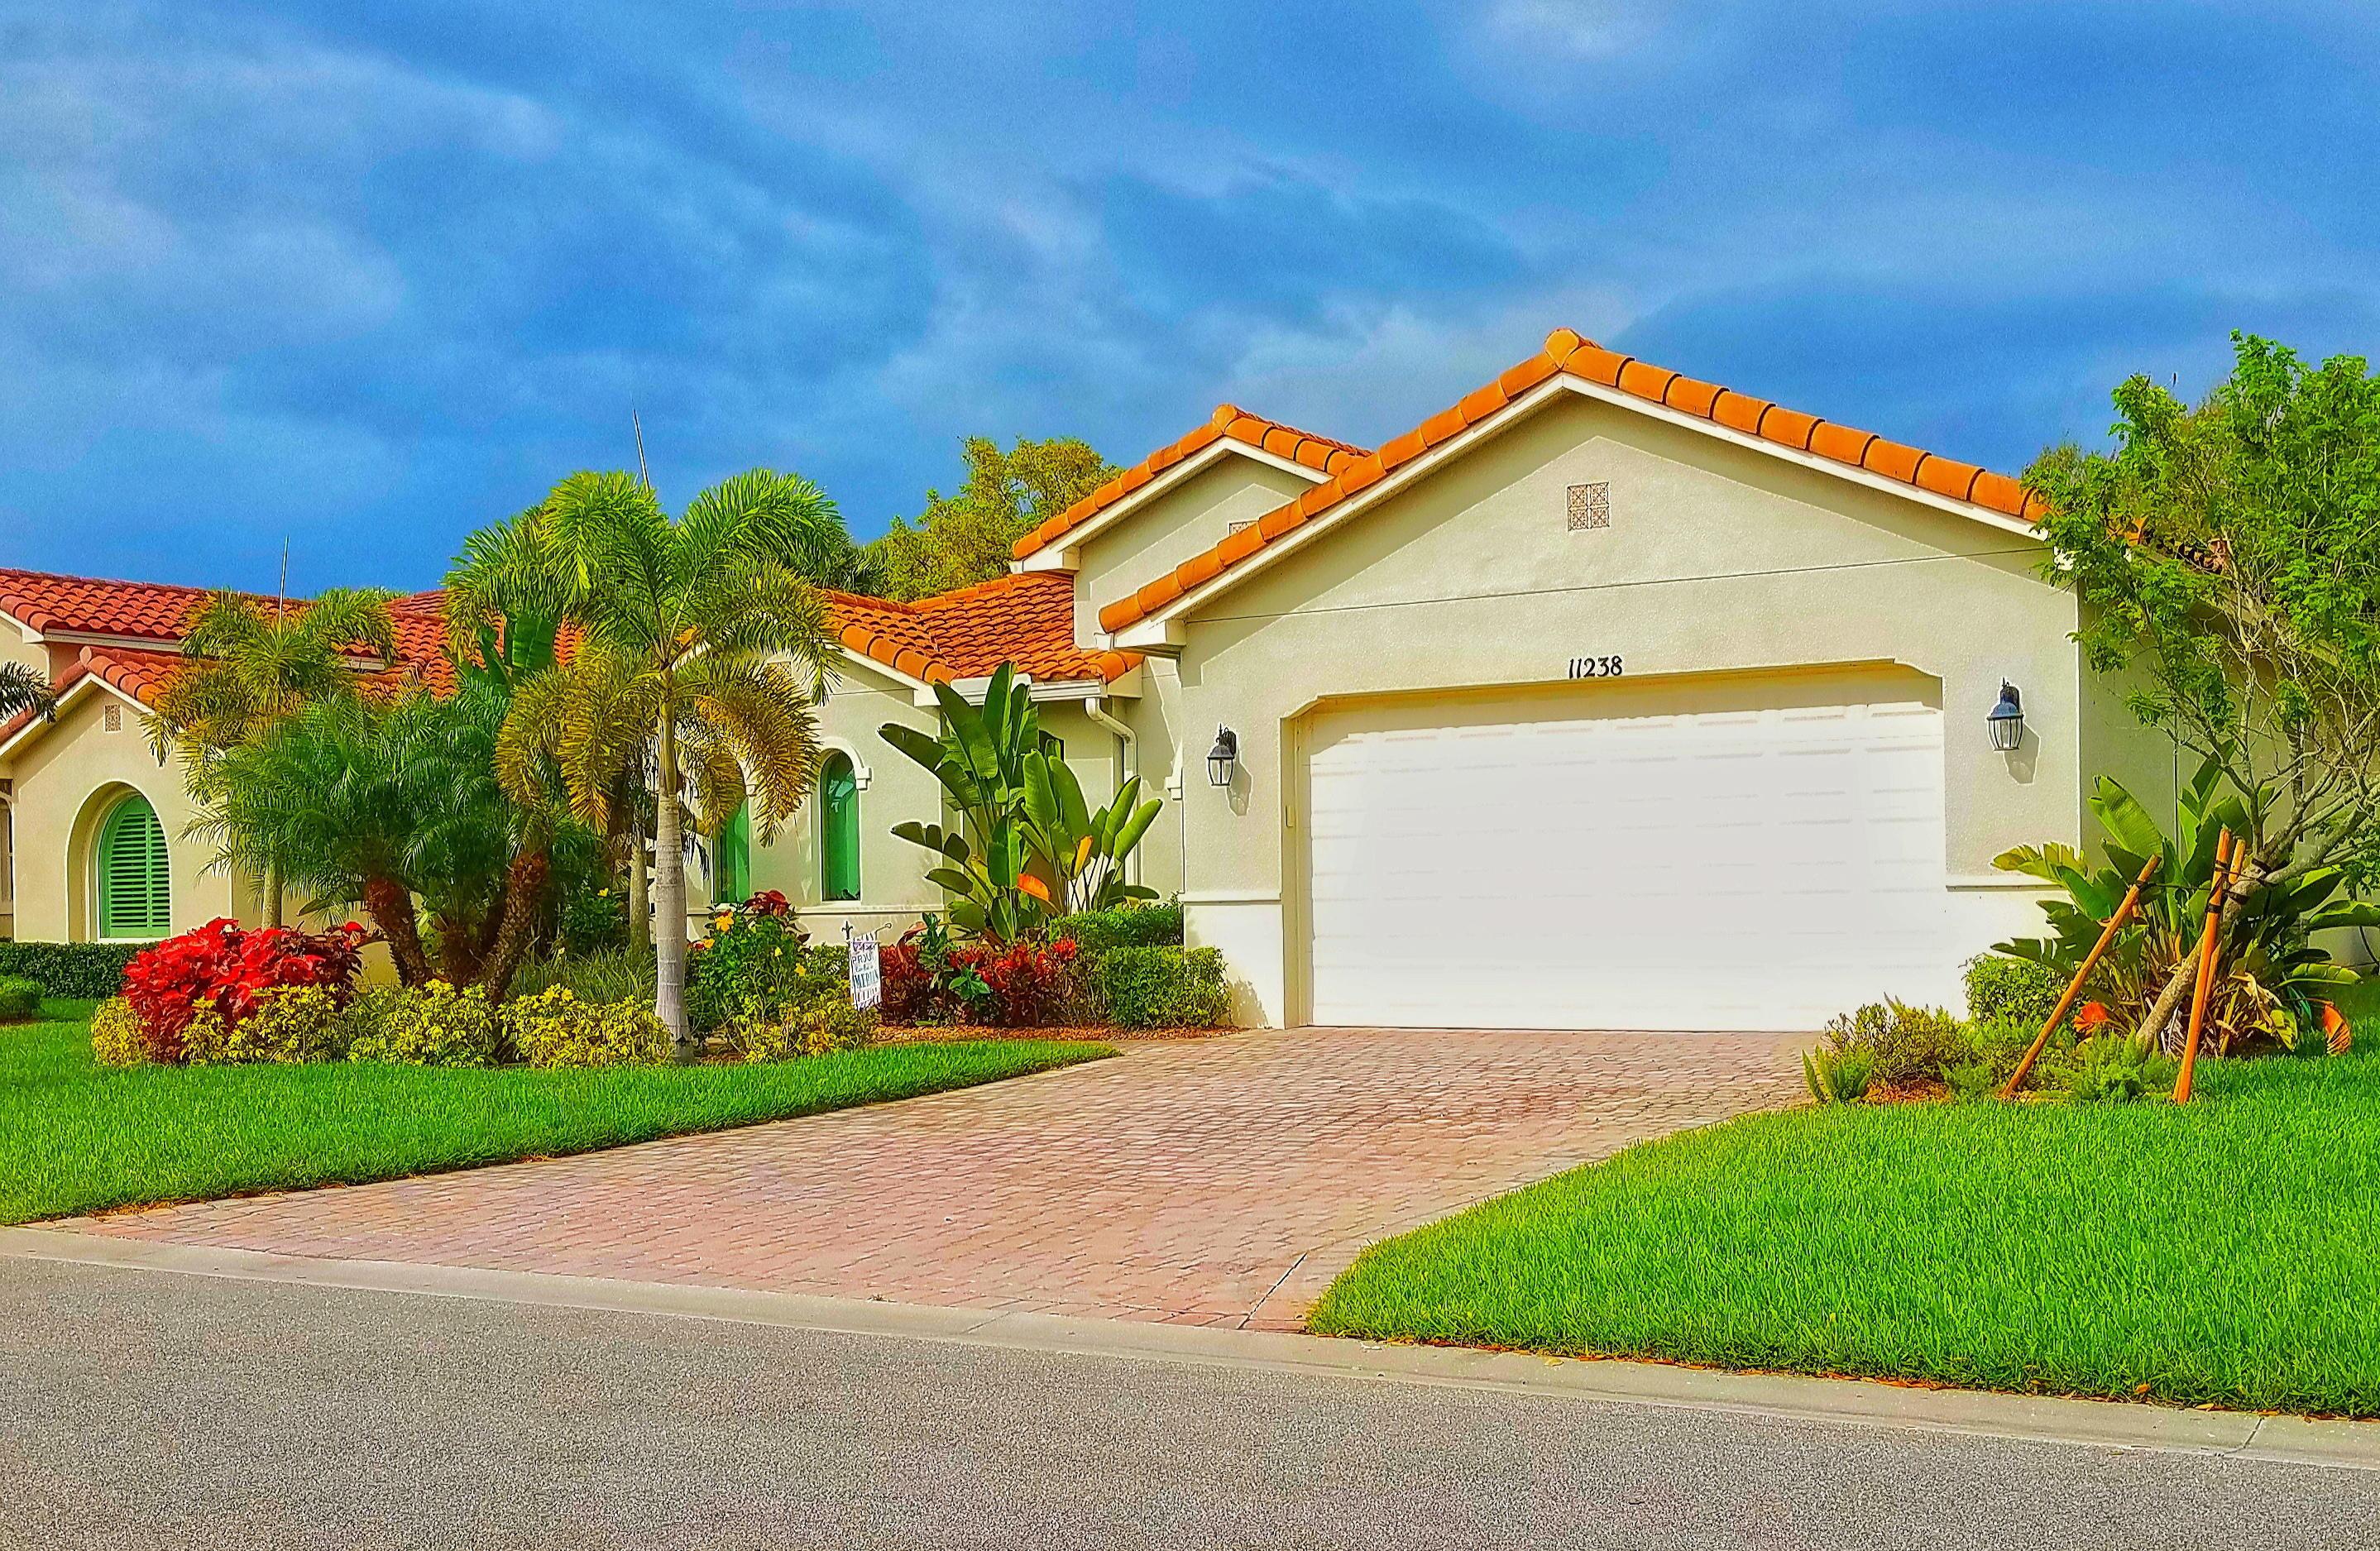 Port Saint Lucie Homes for Sale -  Custom Built,  11238 SW Apple Blossom Trail